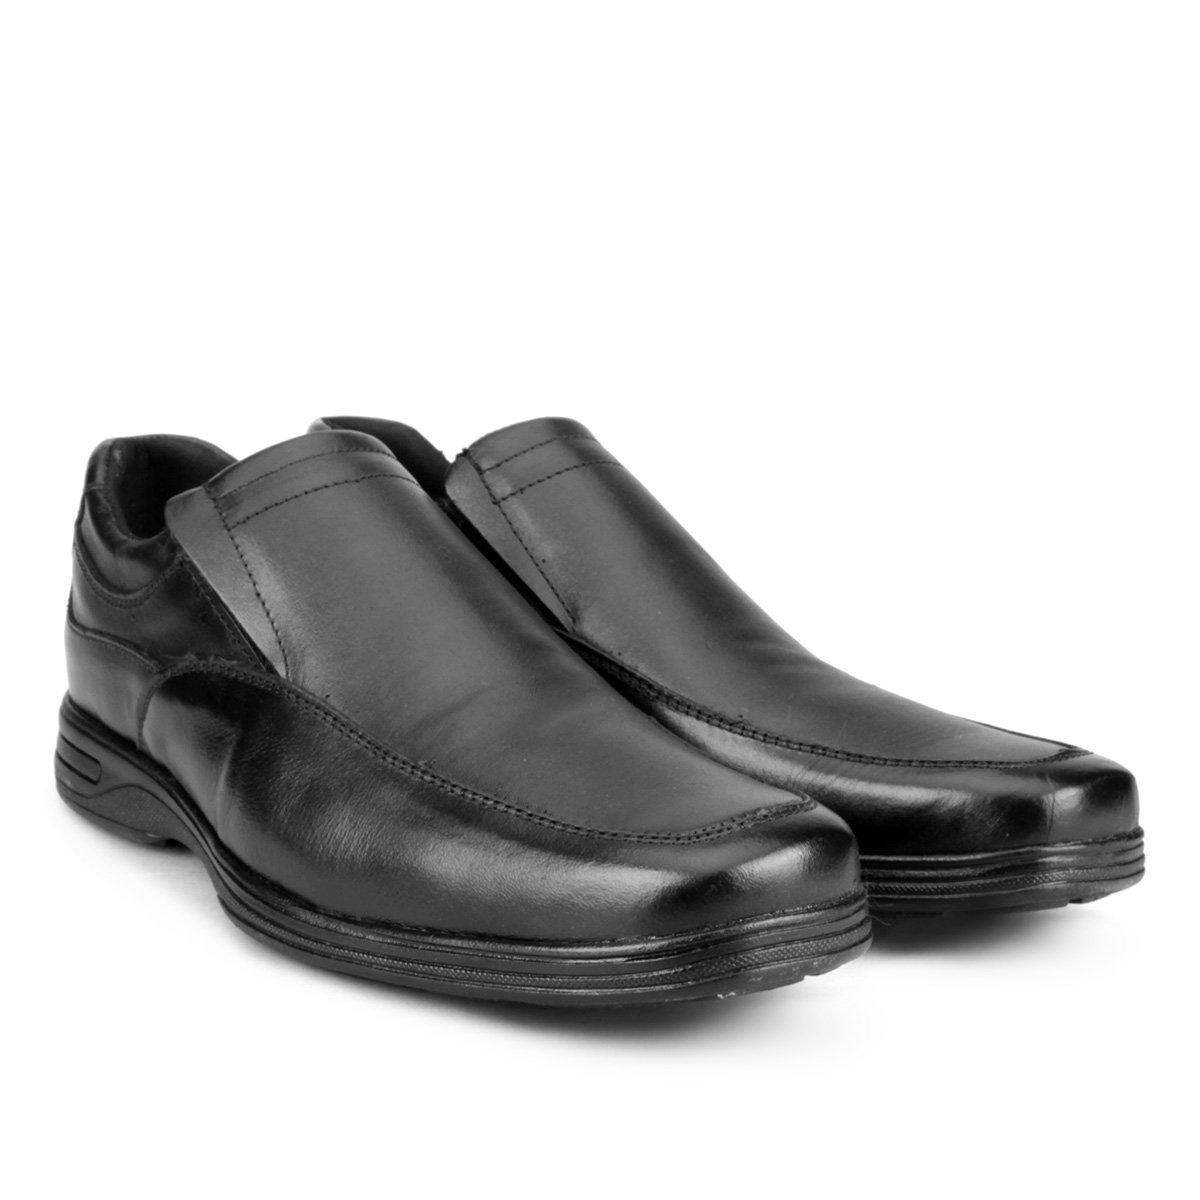 Preto Sapato Social de de Sapato Couro Social Masculino Walkabout R8wOq1xgp